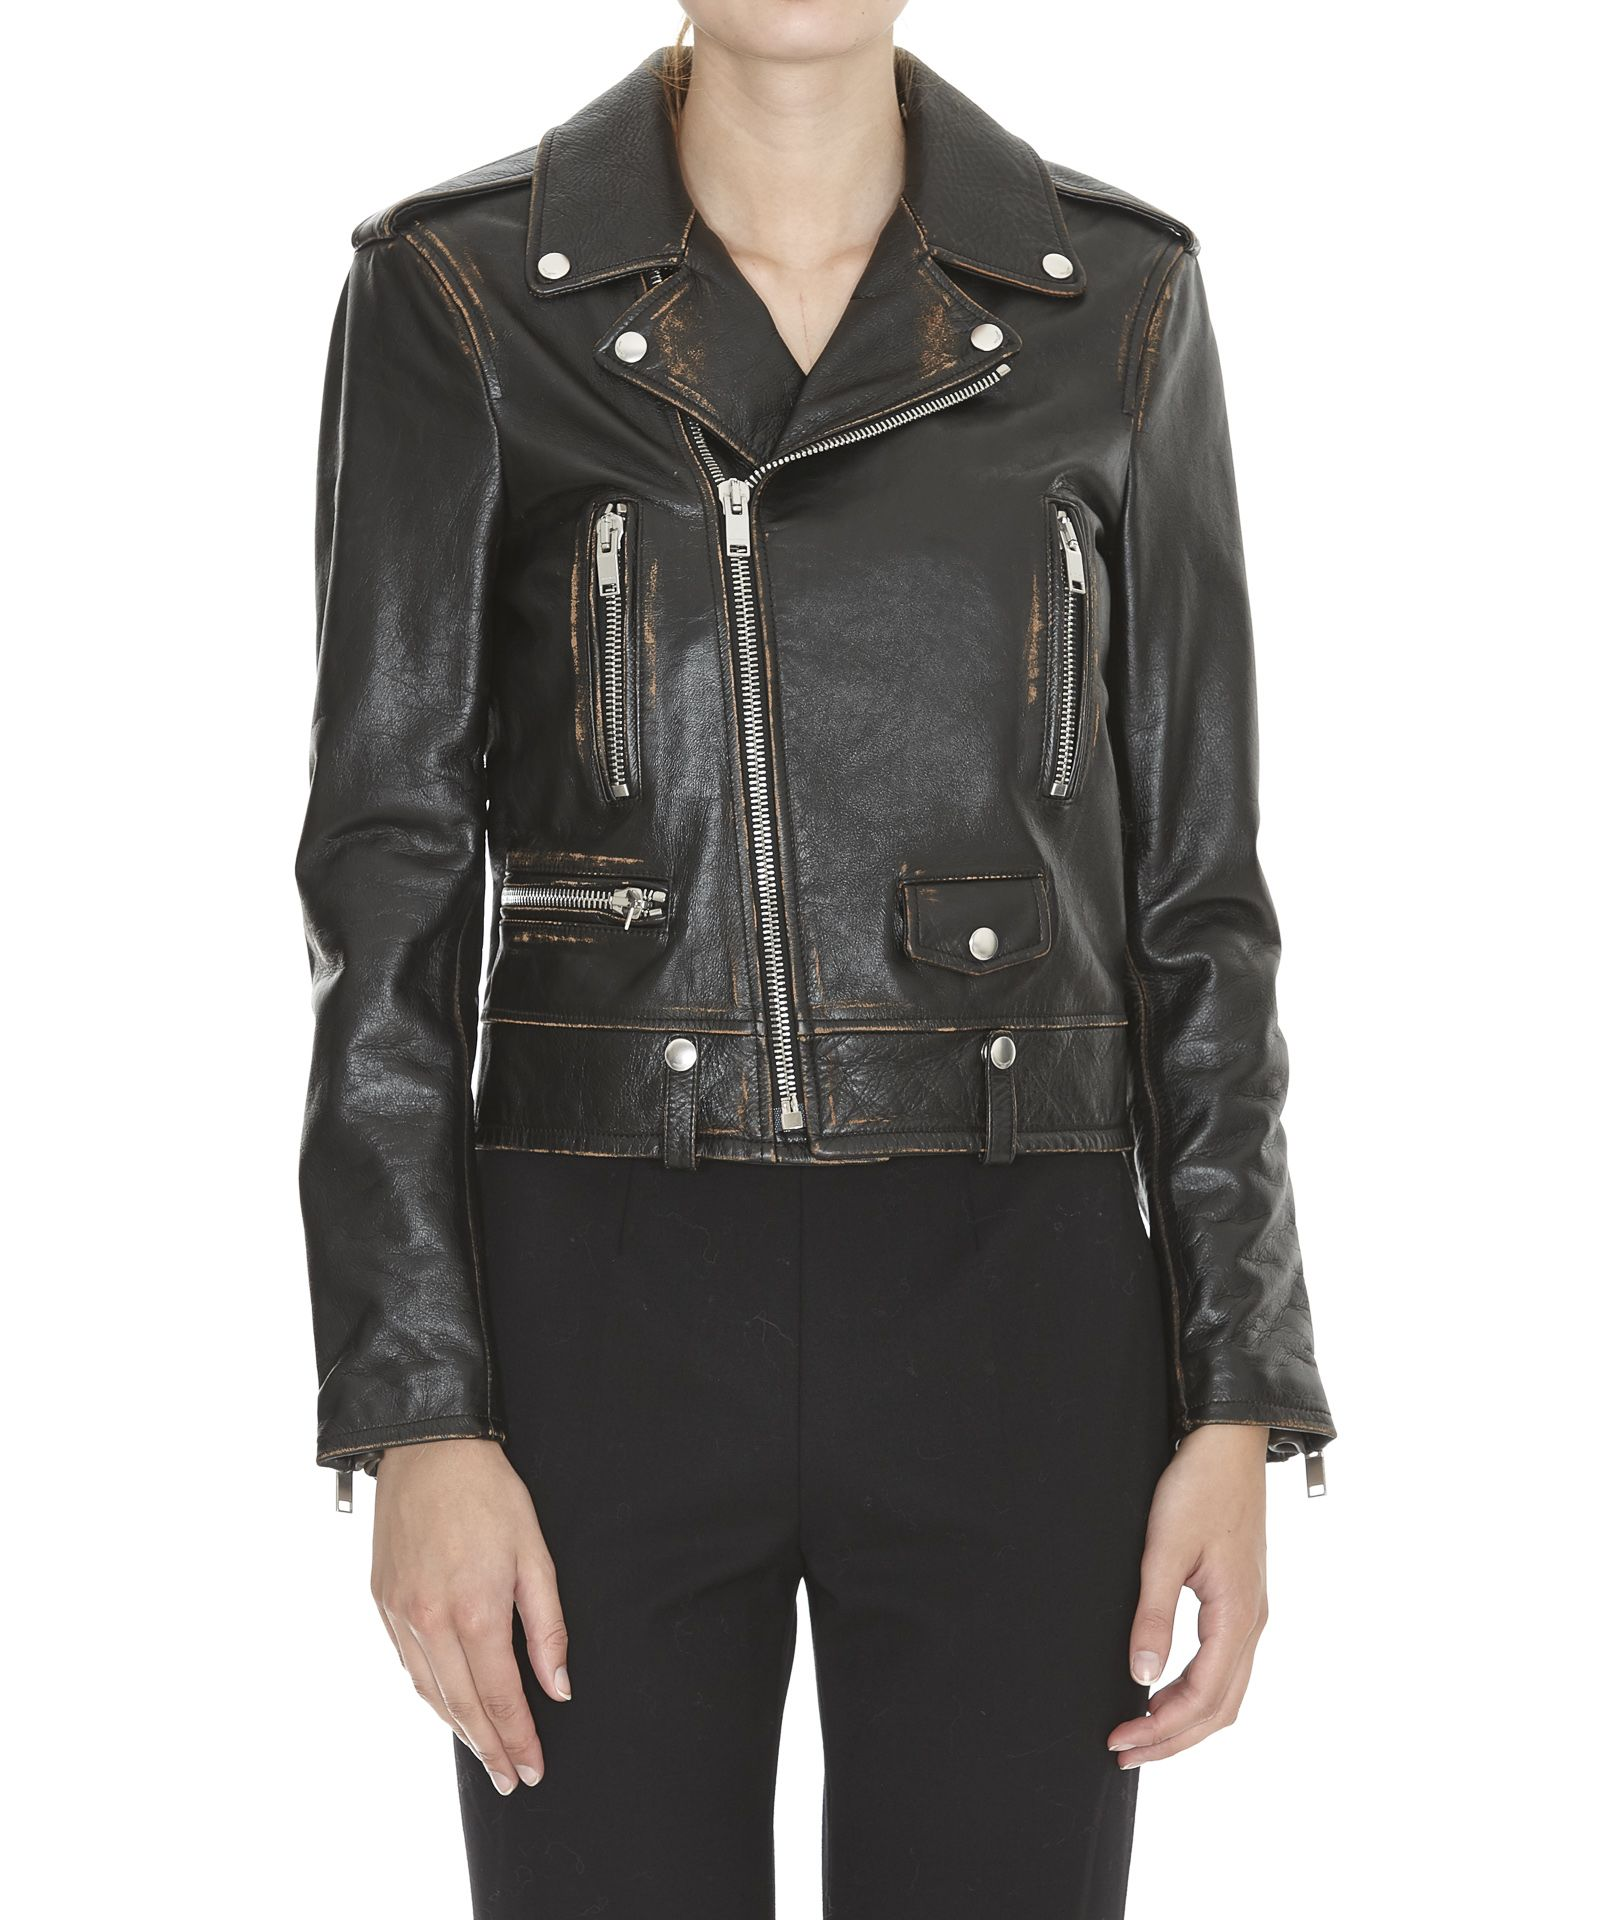 Saint Laurent Crust Vintage Jacket